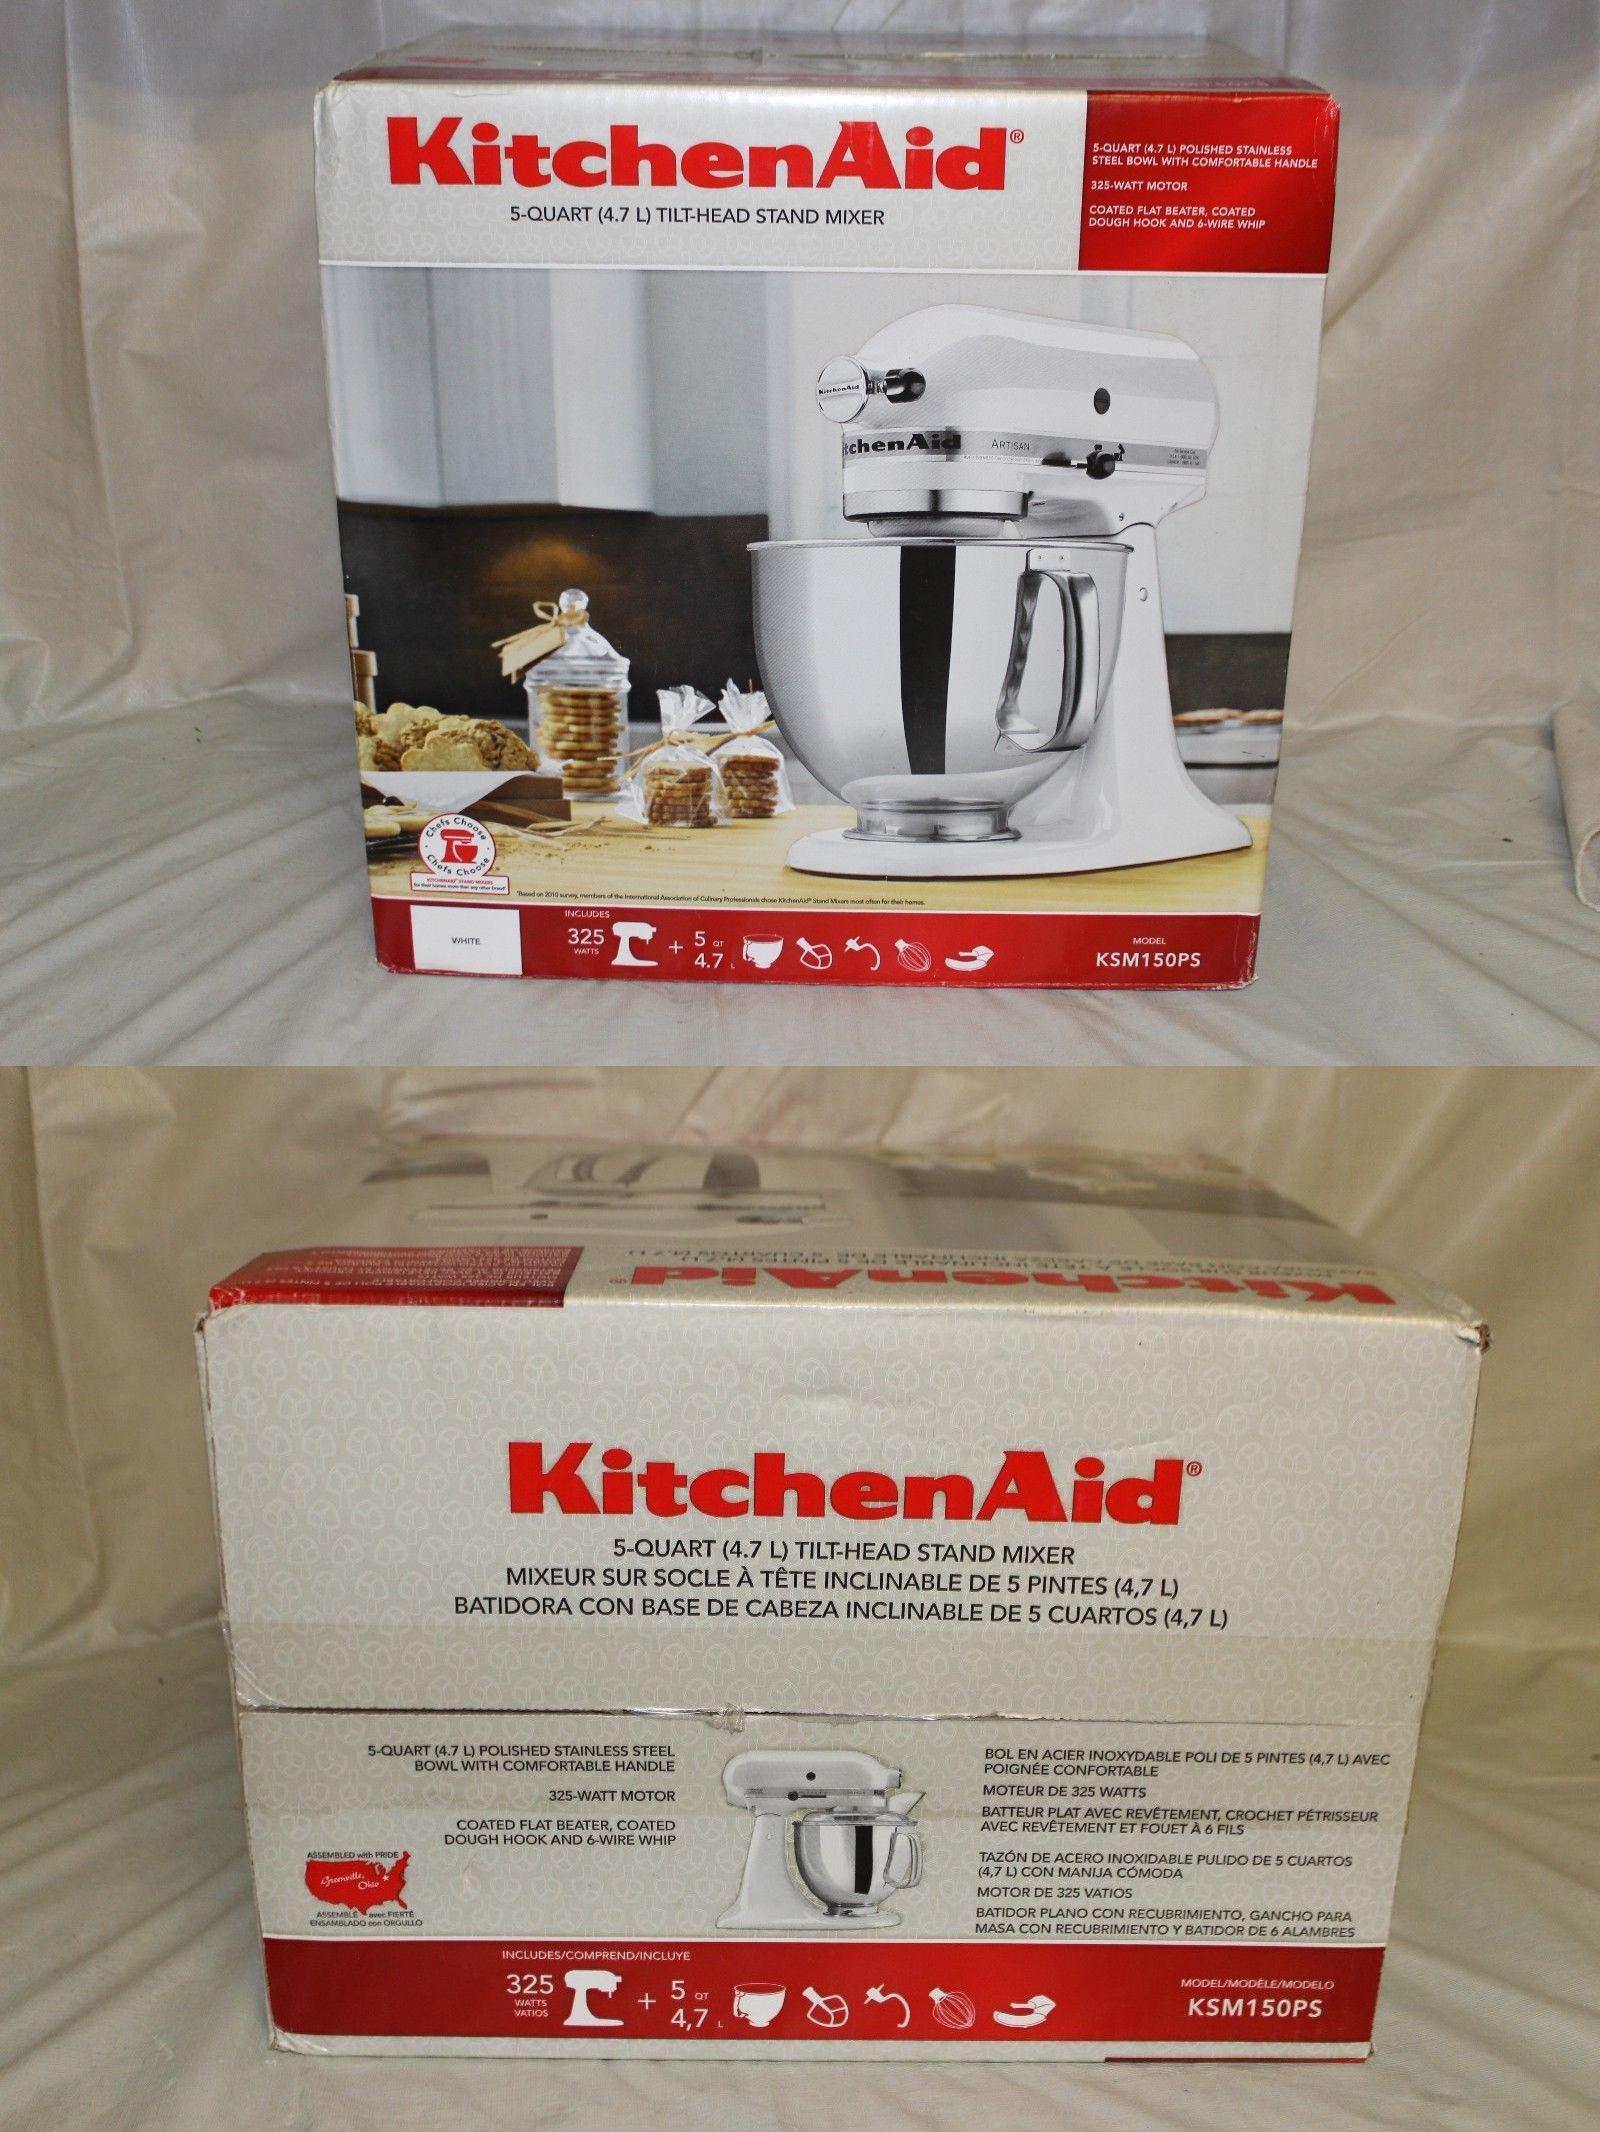 small kitchen appliances  kitchenaid artisan ksm150ps 5qt 325 watt tilt head stand mixer   new small kitchen appliances  kitchenaid artisan ksm150ps 5qt 325 watt      rh   pinterest com